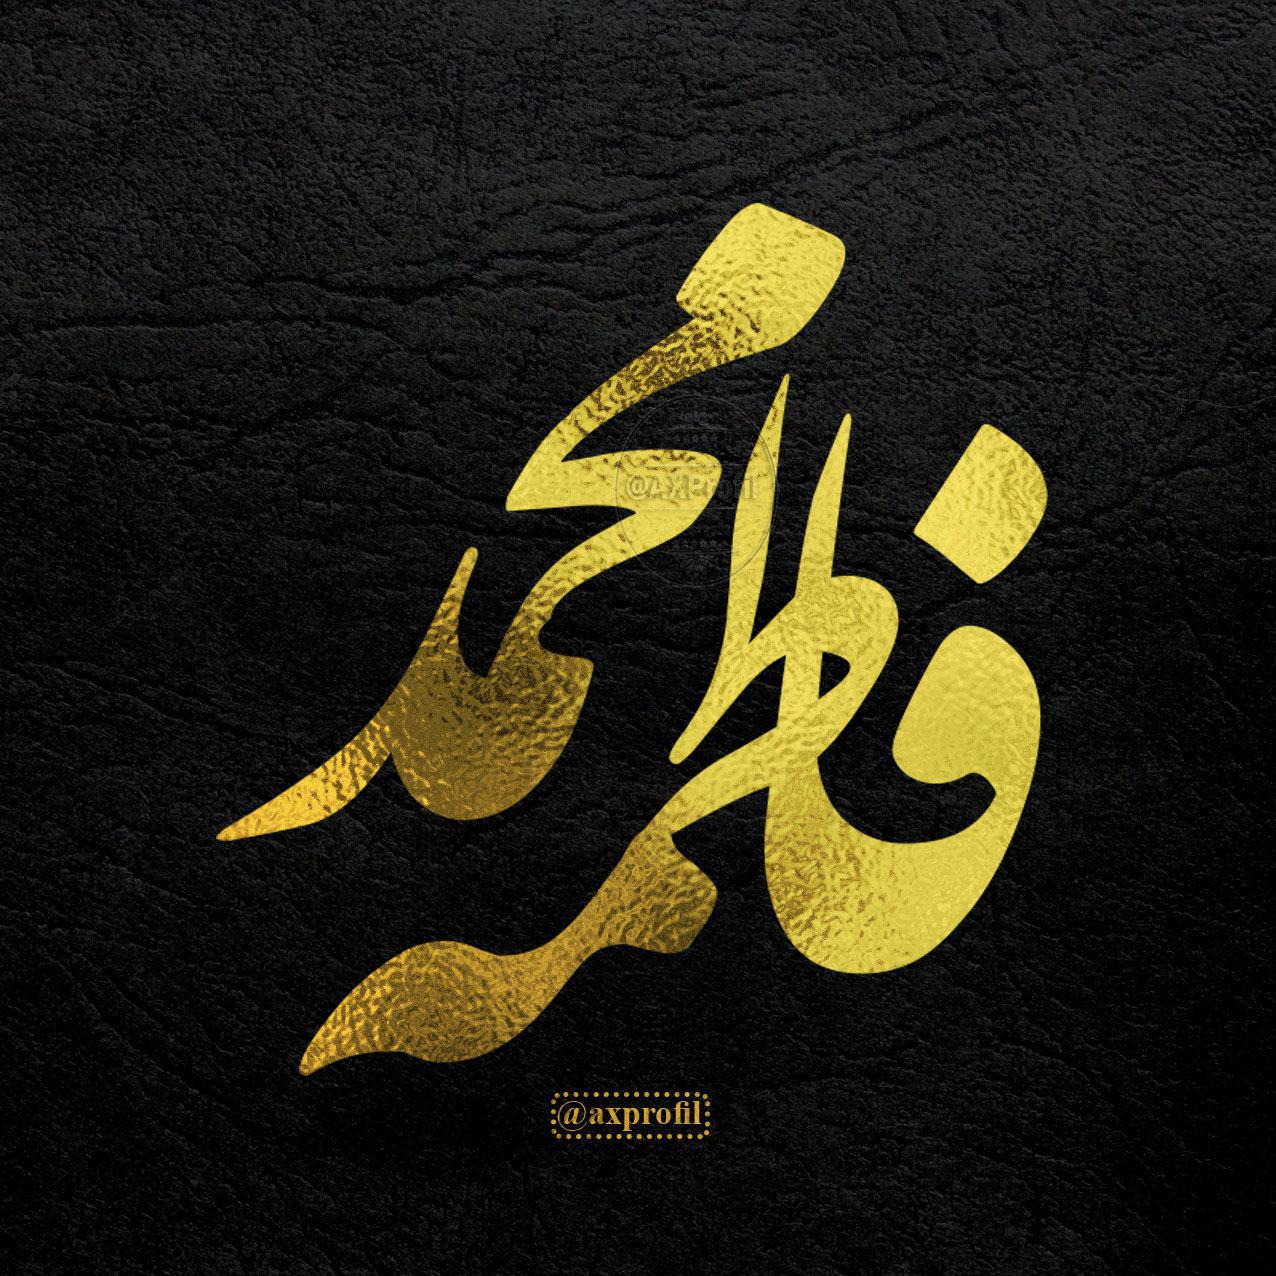 طرح گرافیکی لوگو اسم عاشقانه اسم محمد و فاطمه